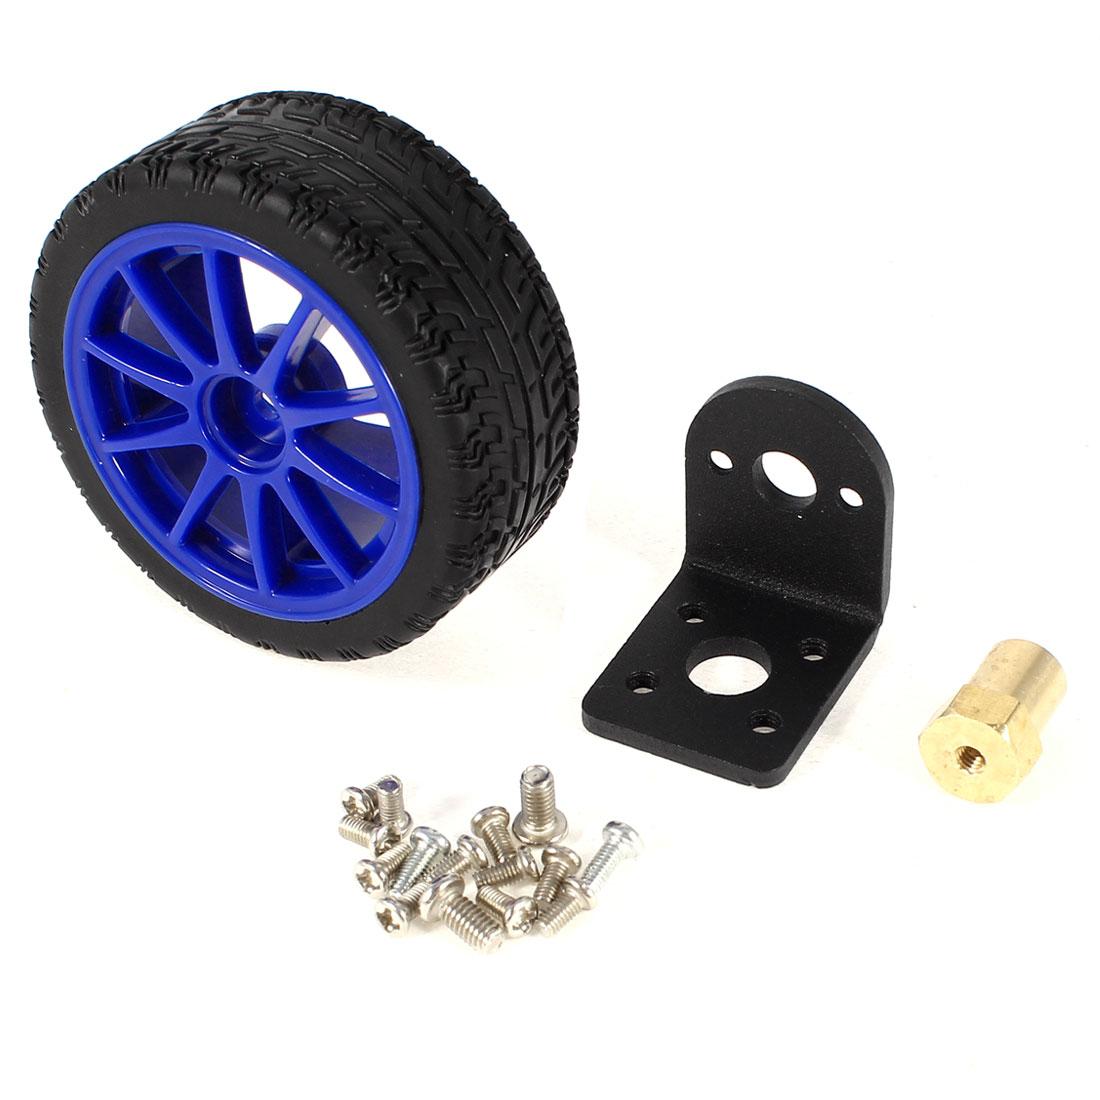 3 in 1 DC Reduction Motor Bracket Tyre Tire Wheel Hex Coupler Set for Smart Car